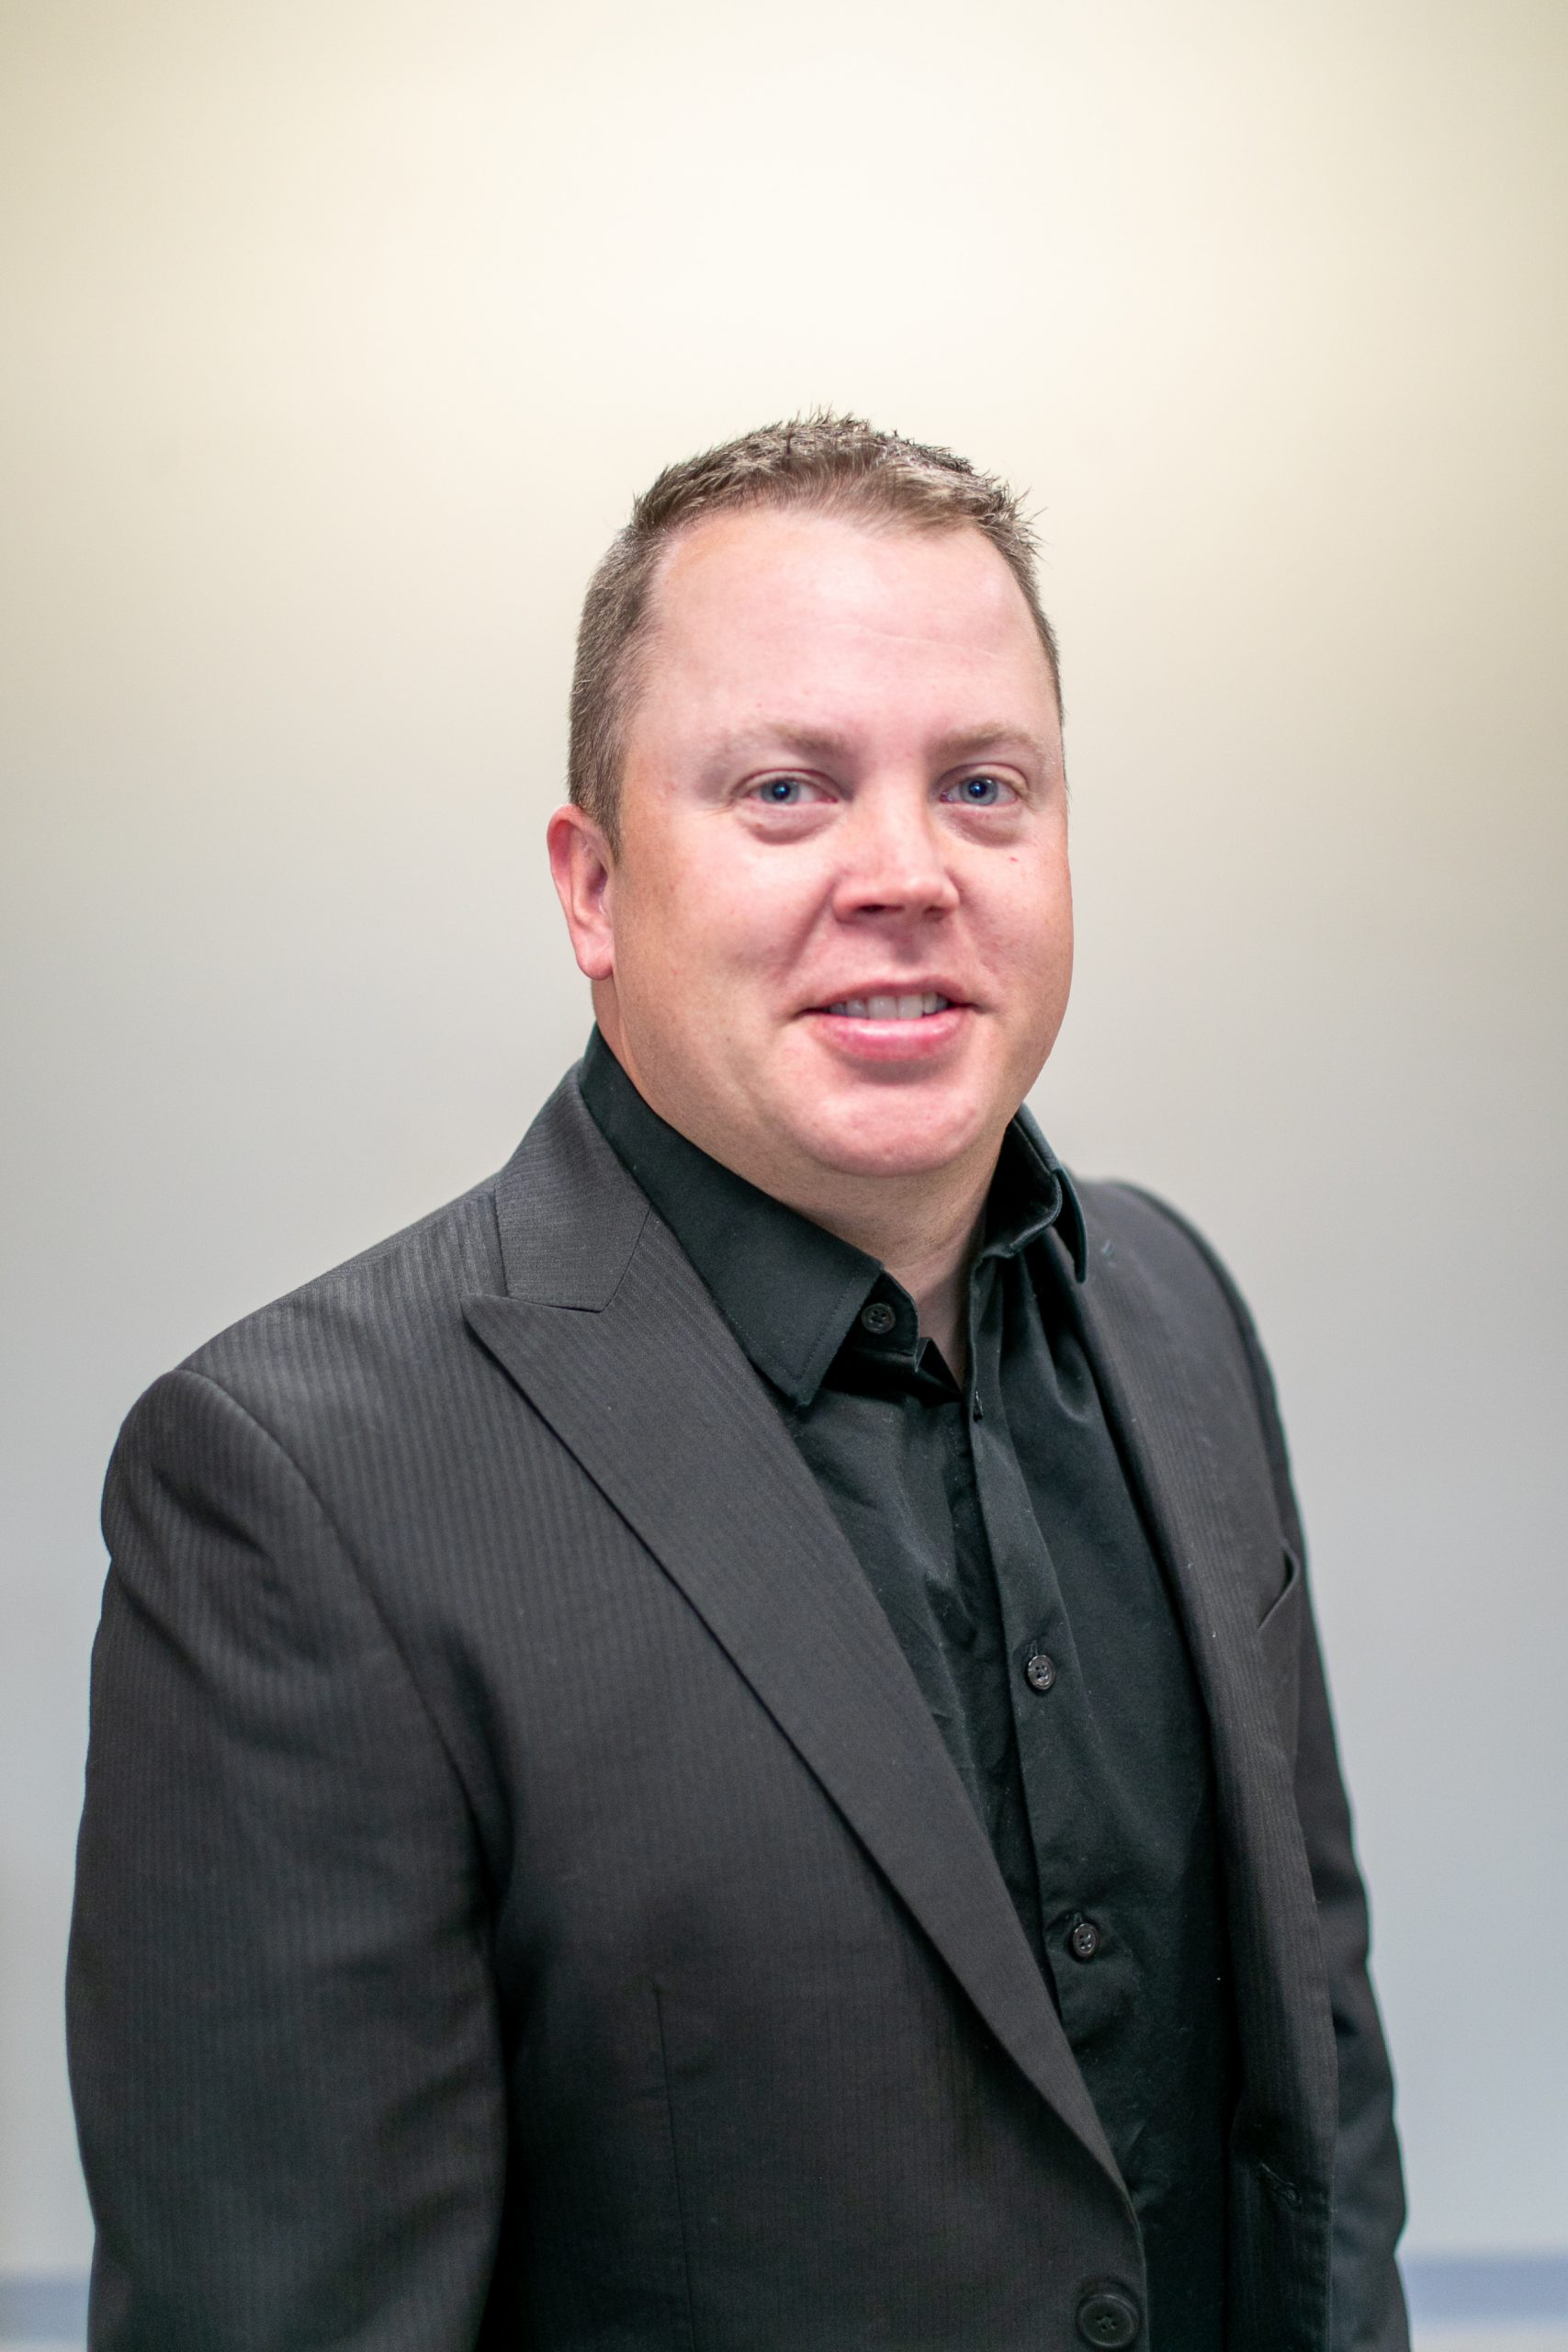 Matt Endres - Director of Finance, LI Group LLC